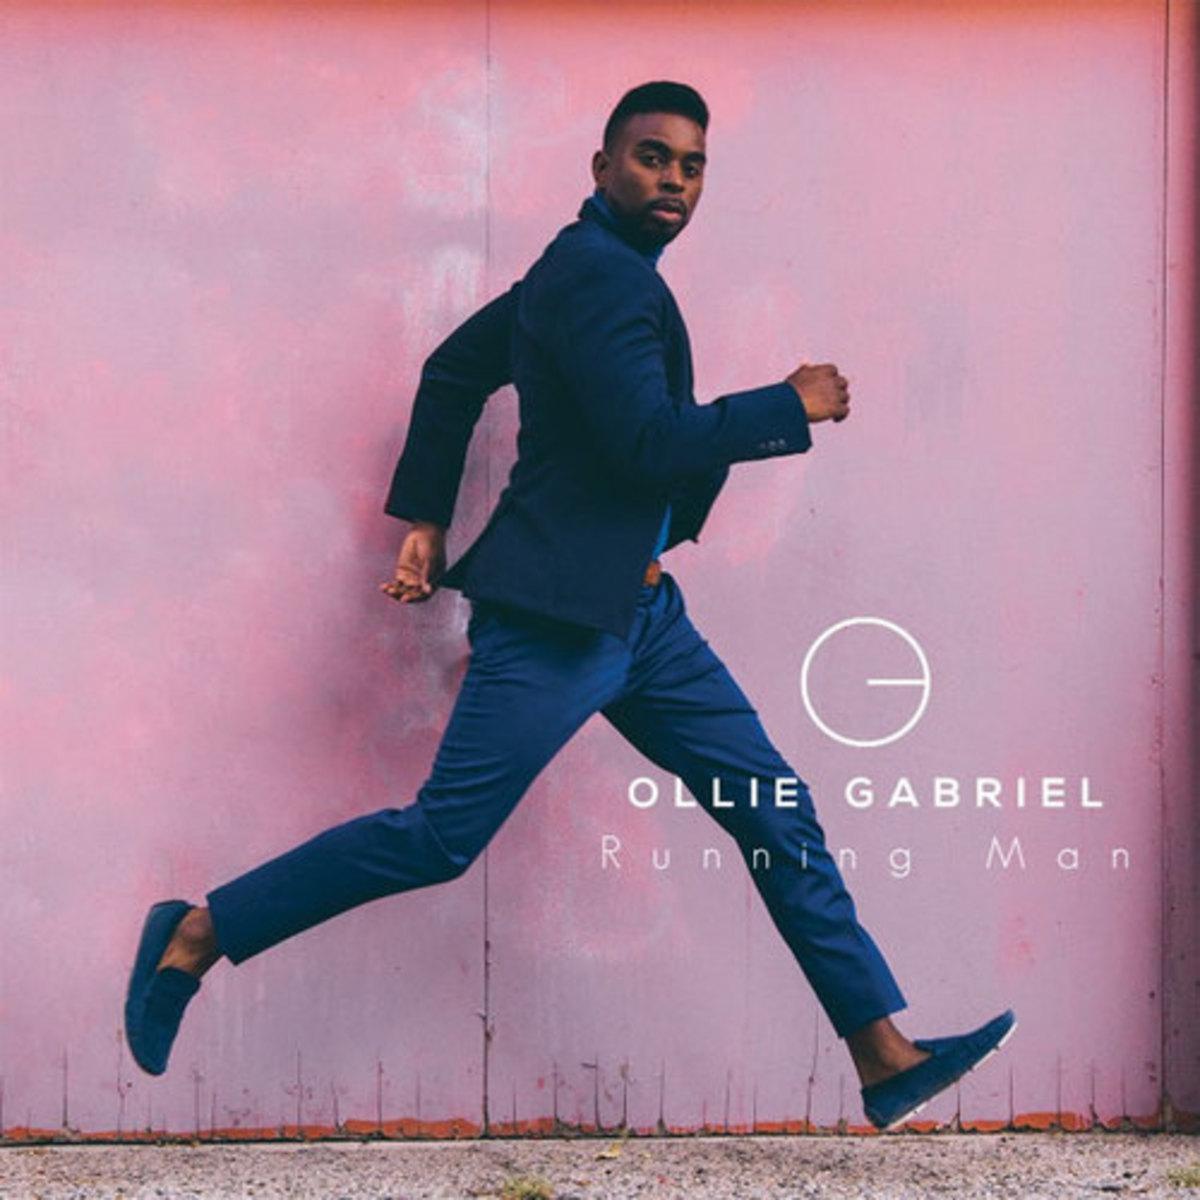 ollie-gabriel-running-man.jpg